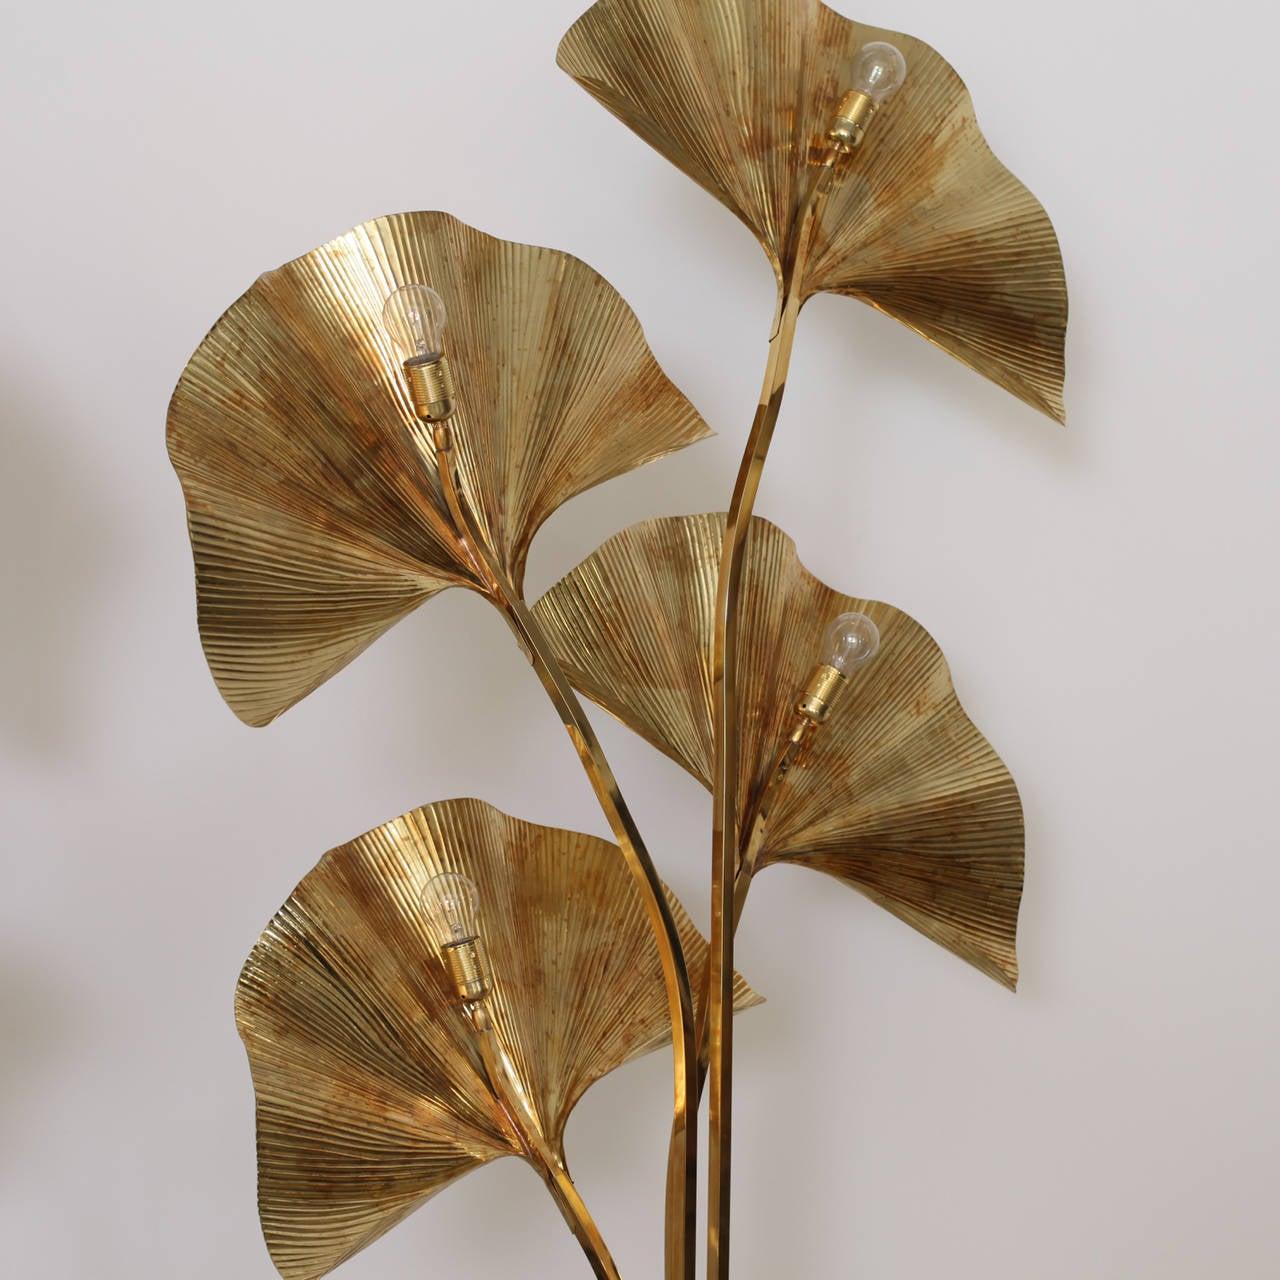 Huge Four Ginkgo Leaf Brass Floor Lamp by Tommaso Barbi 2